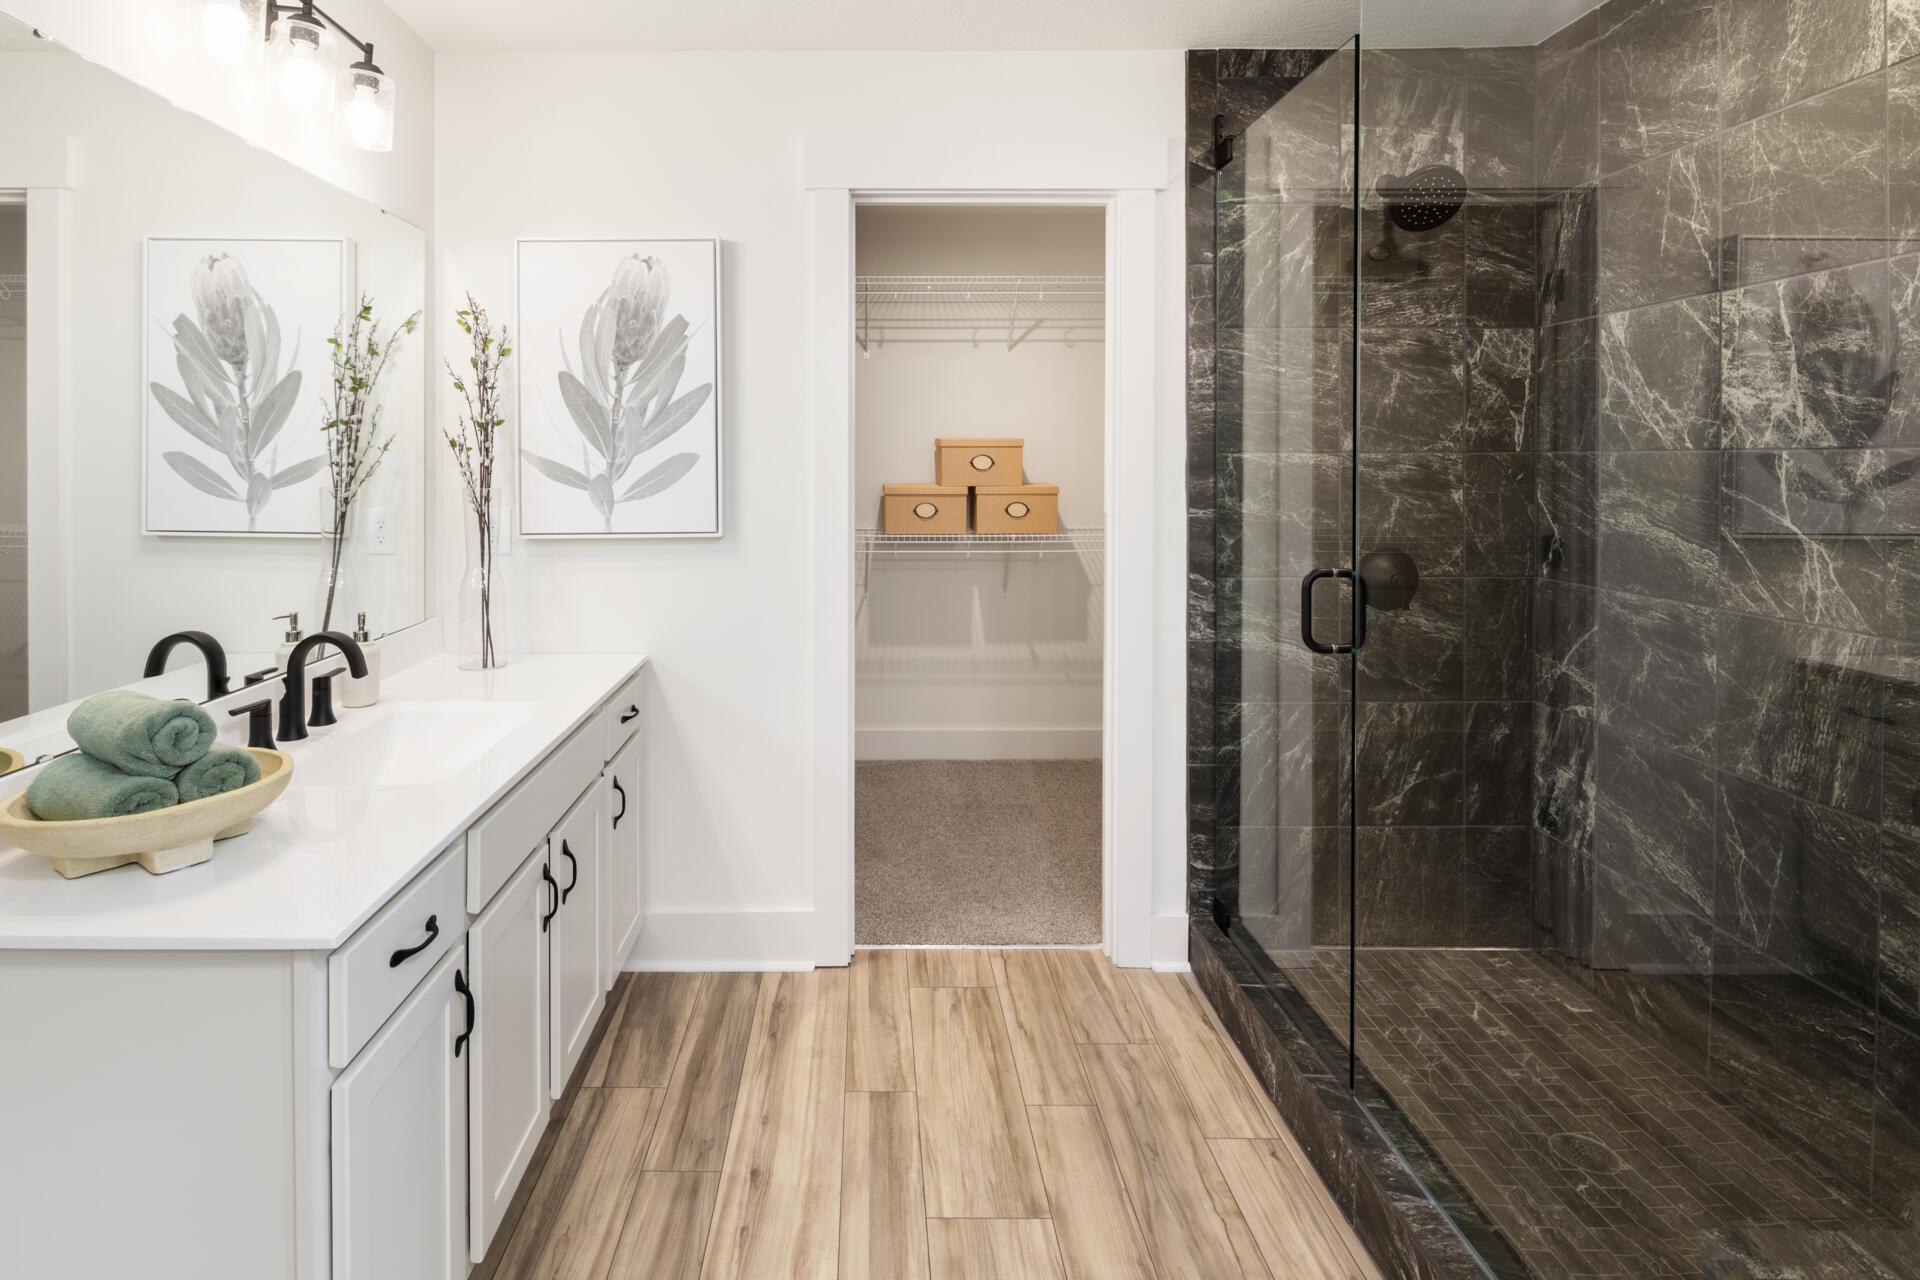 Bathroom featured in the Wembley By Drees Homes in Cincinnati, OH